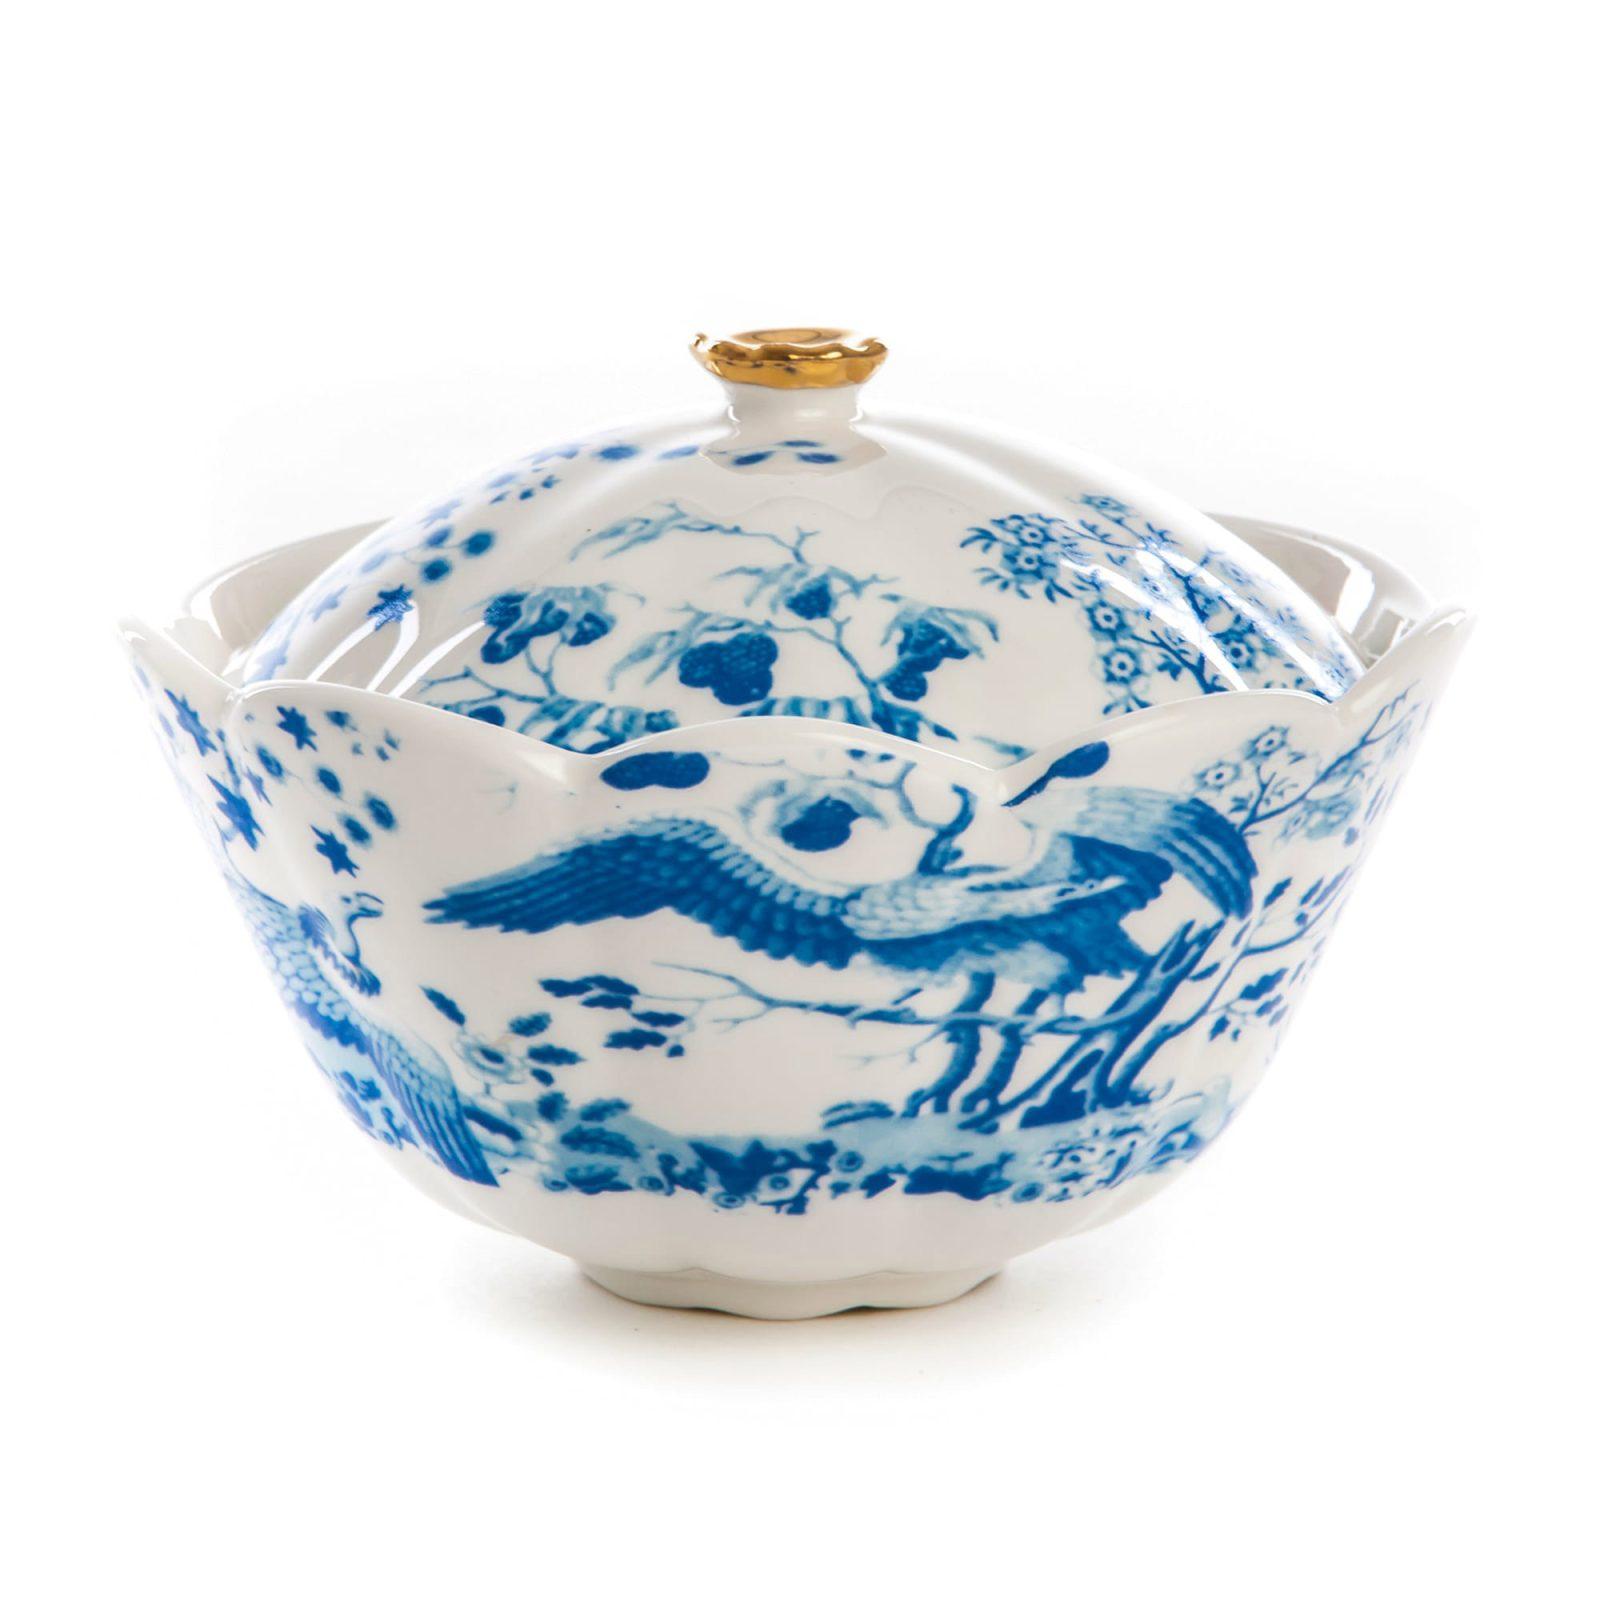 Seletti Hybrid Collection, Maurilia Sugar Bowl -32456